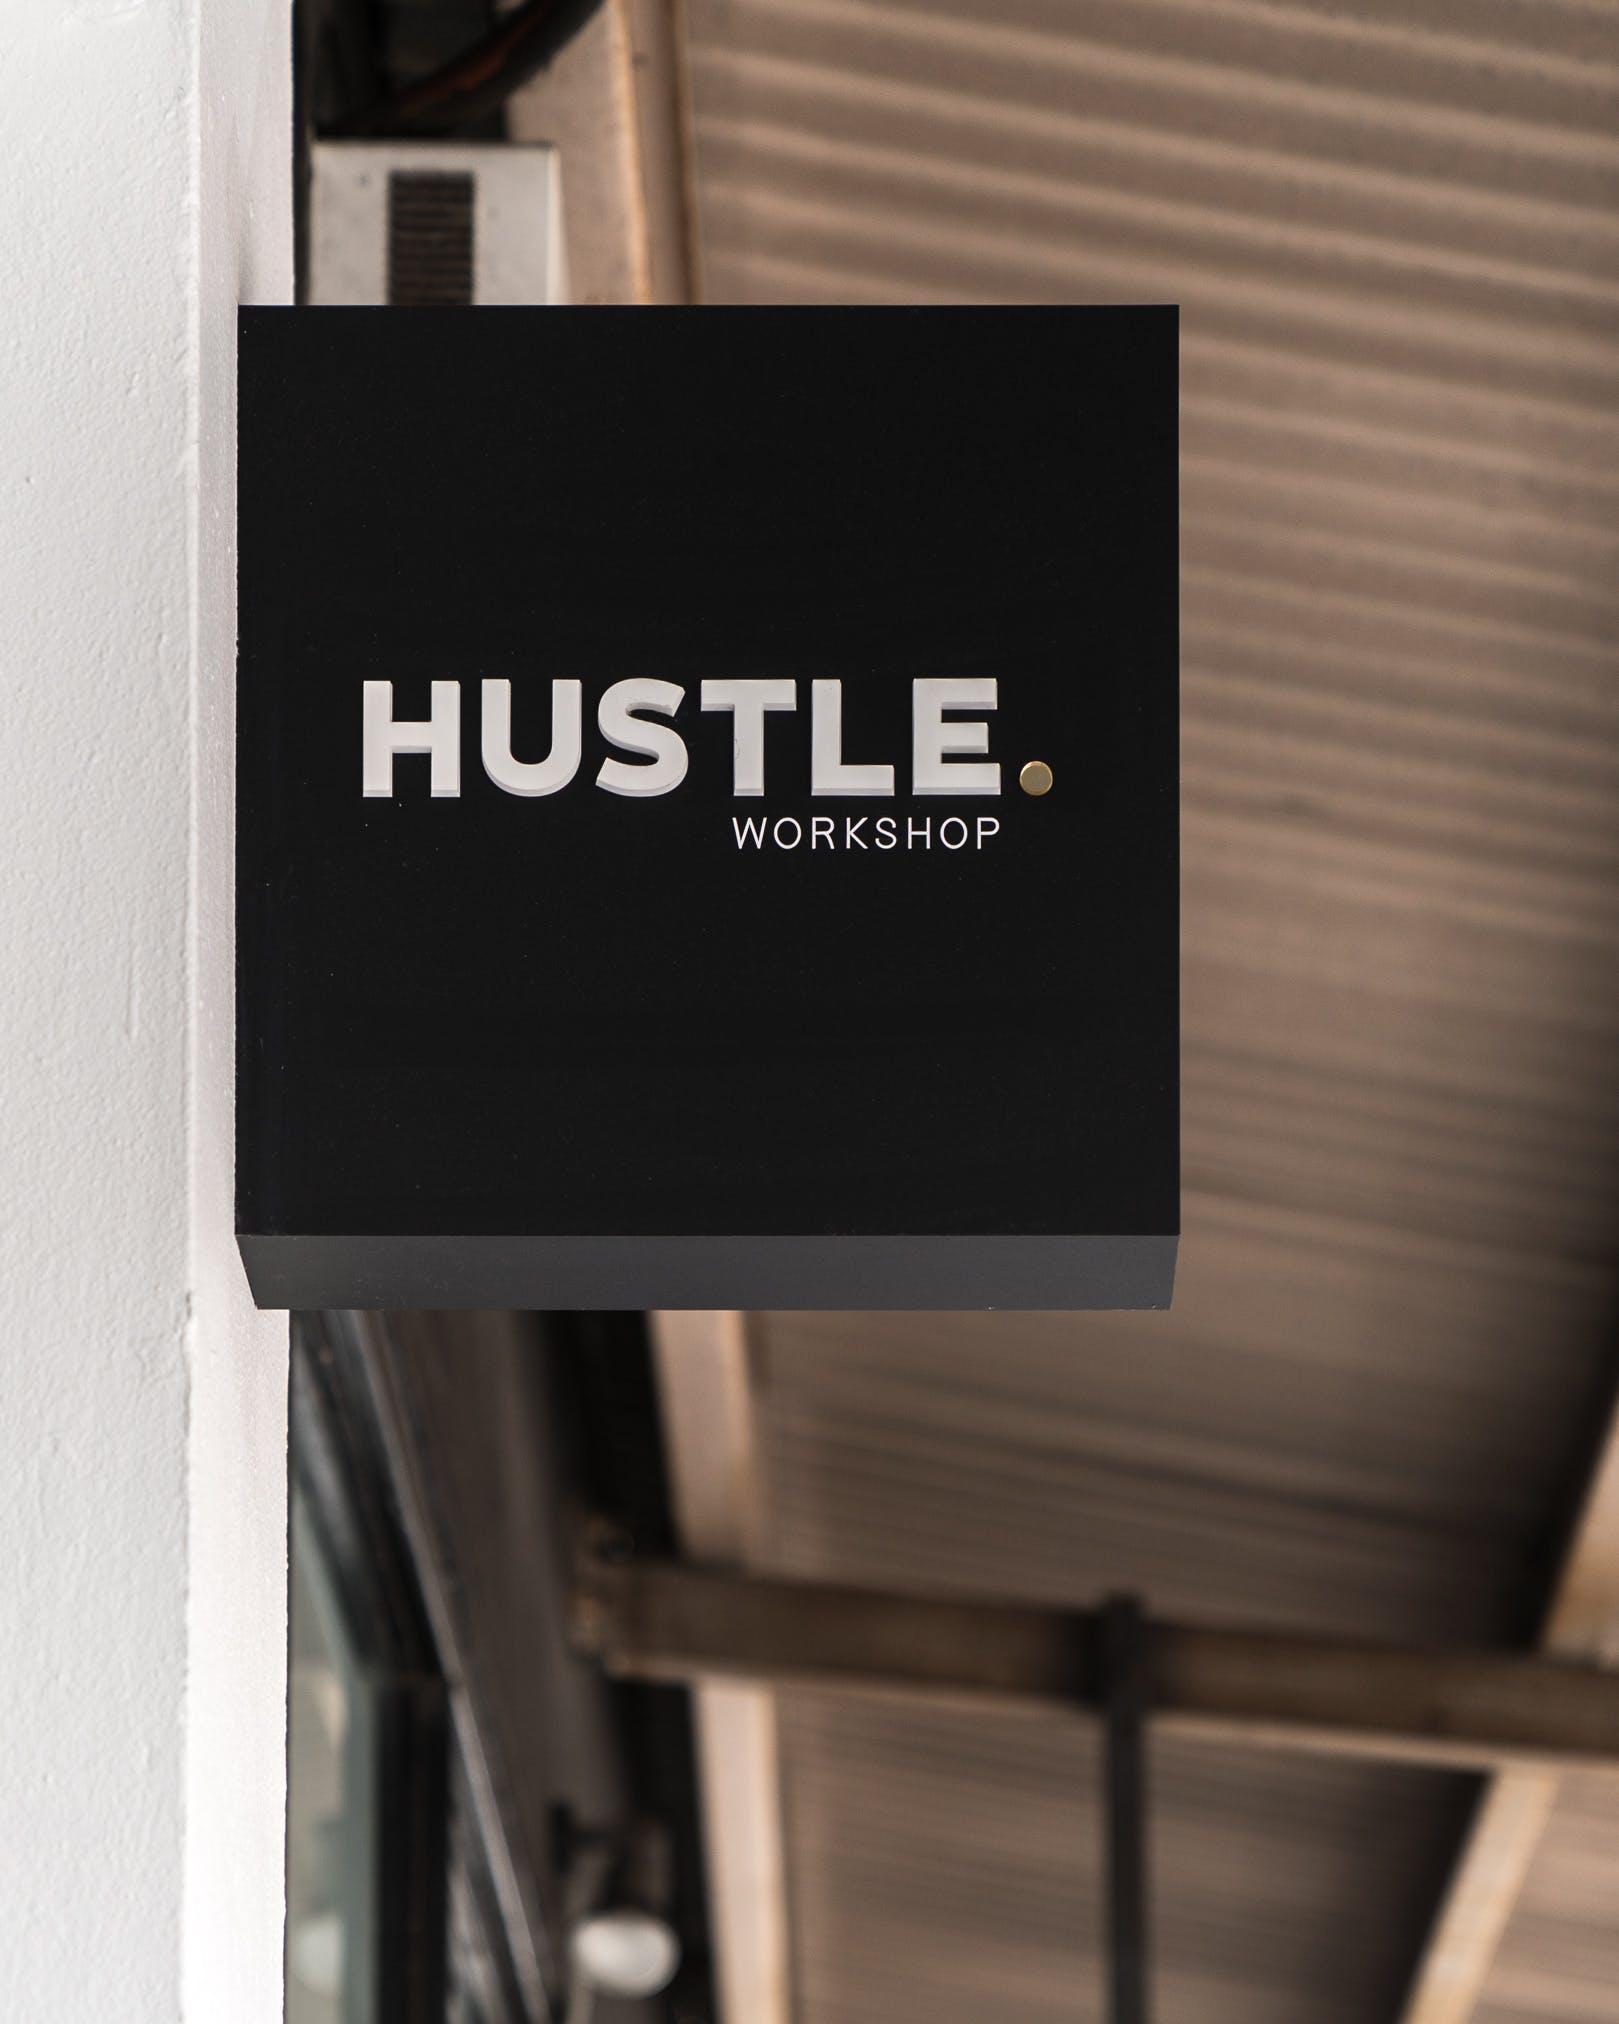 Hustle Workshop , creative studio at Hustle Studio, image 10